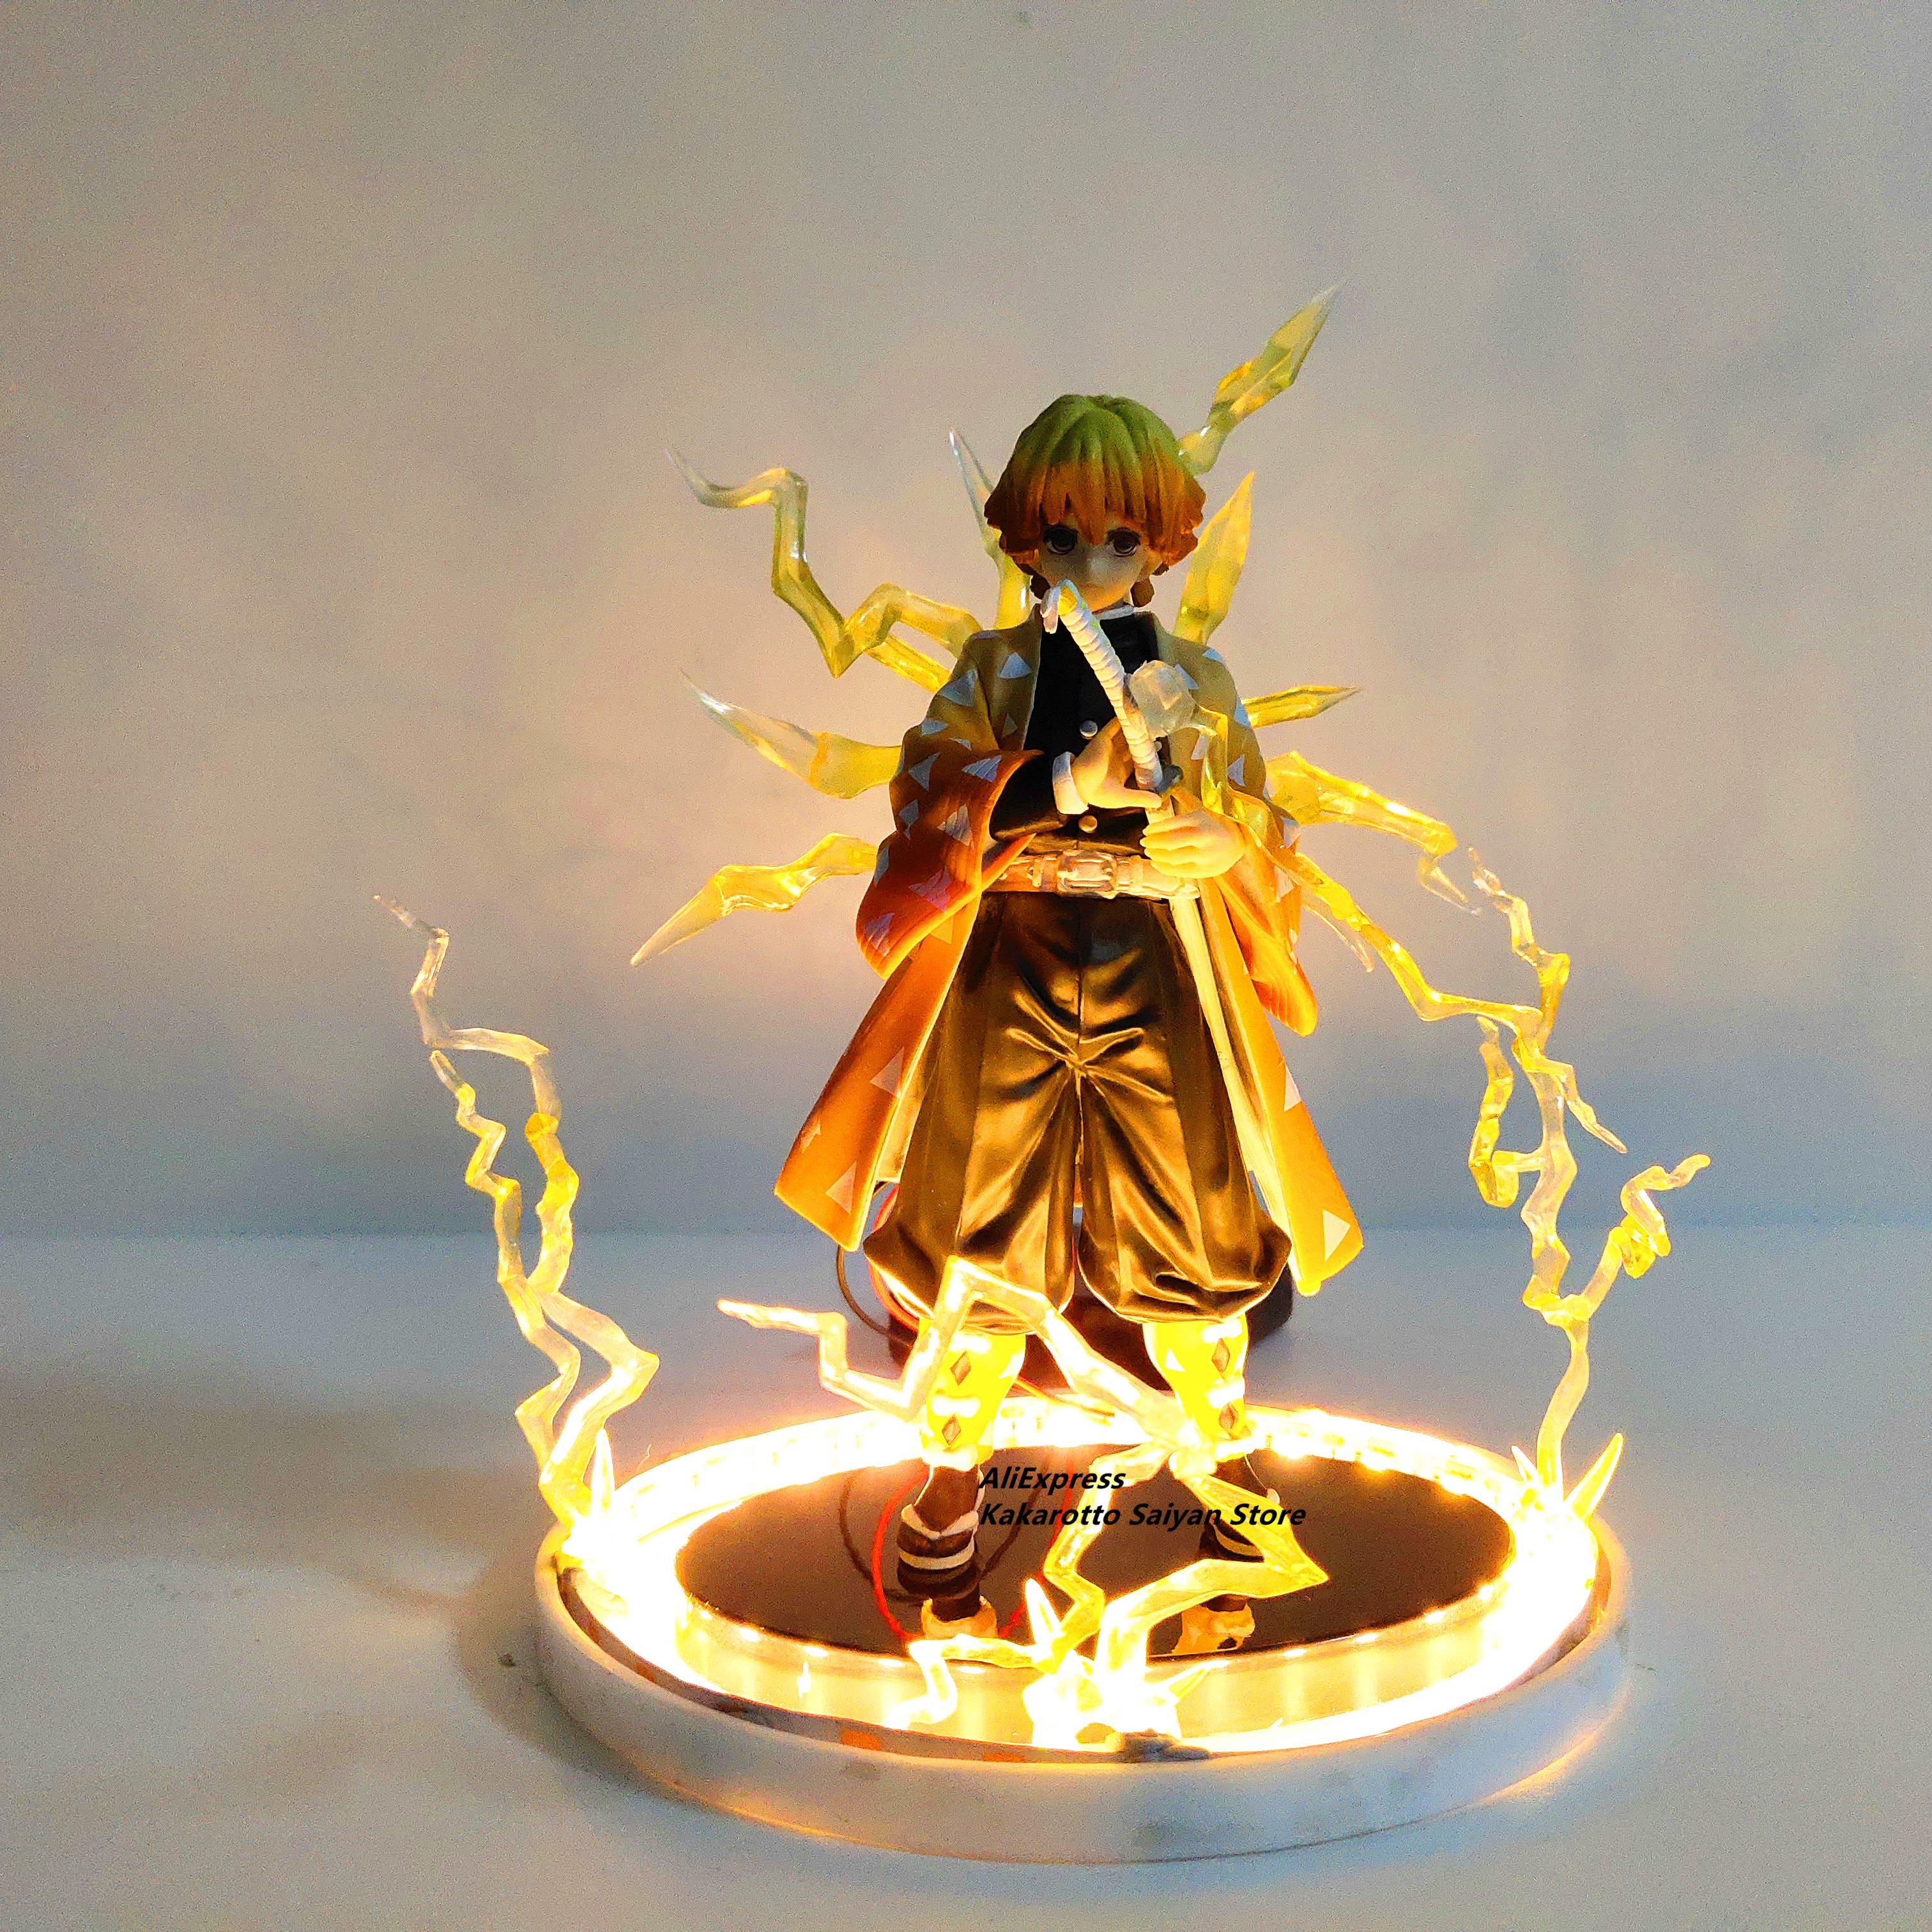 Dämon Slayer Agatsuma Zenitsu PVC Action-figuren Thunderclap und Flash Wirkung Anime Kimetsu keine Yaiba Figurine Modell Spielzeug